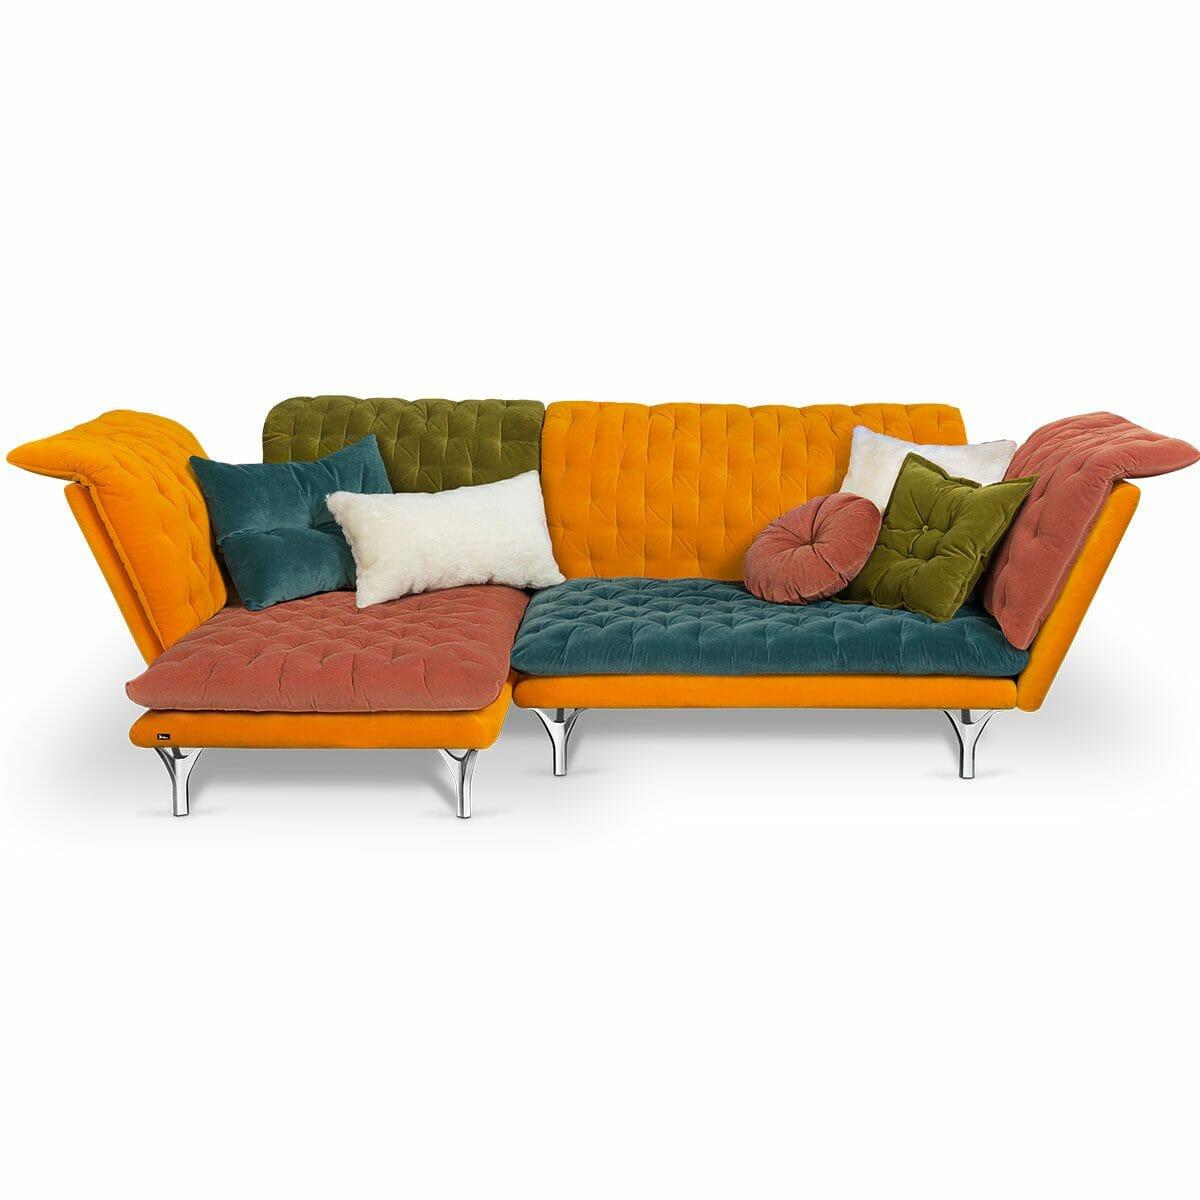 Bretz Pliée Sofa Xli-Ure 115 in bunt